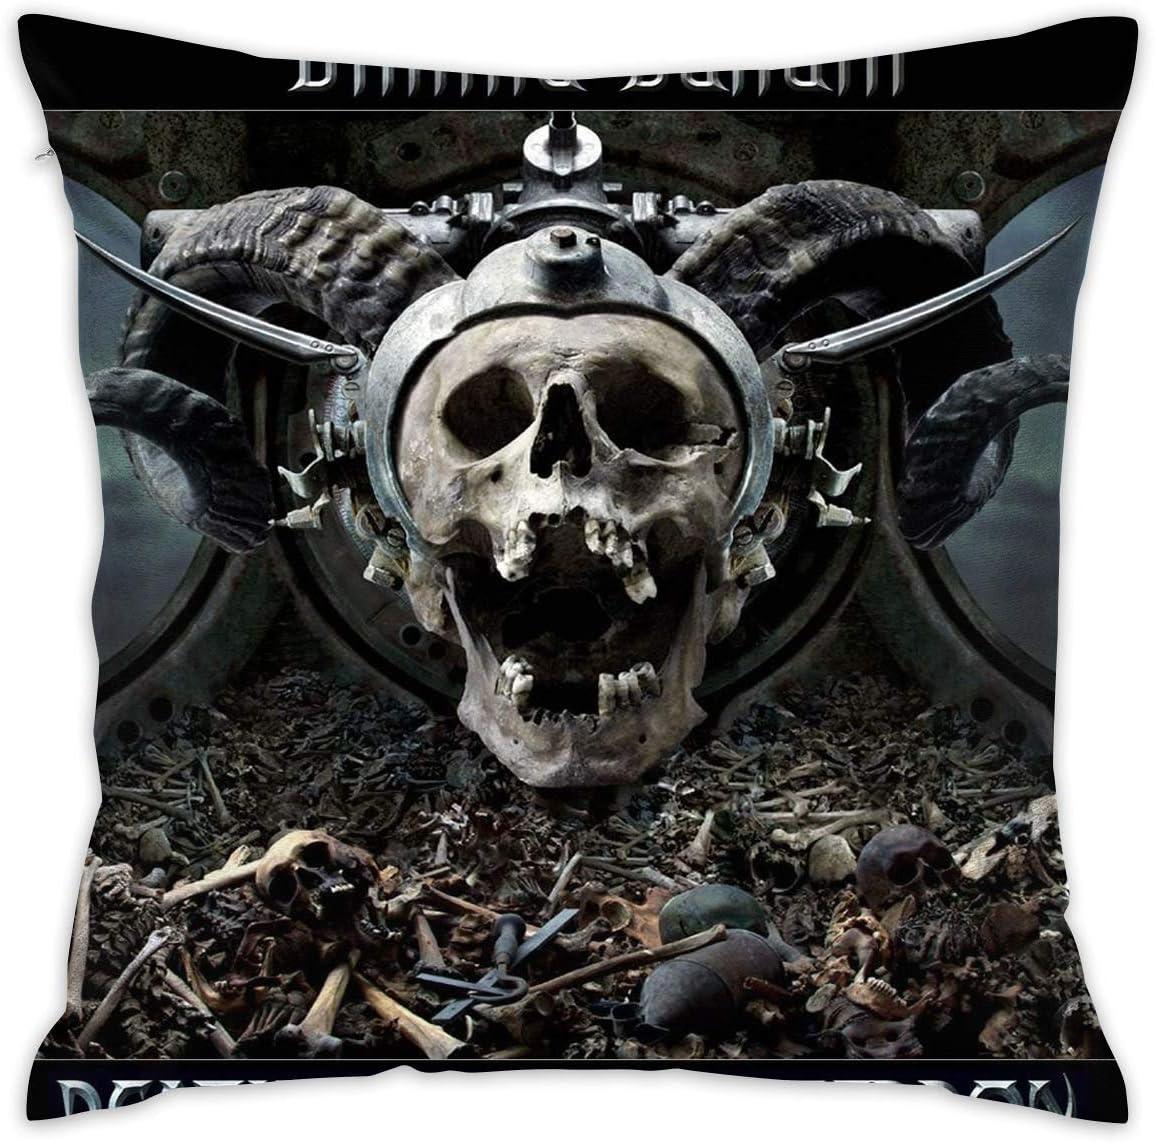 Amazon Com Larry C Adamson Slayer Band Throw Pillow Case Decorative Cushion Cover Pillowcase For Sofa 20 X 20 Home Kitchen